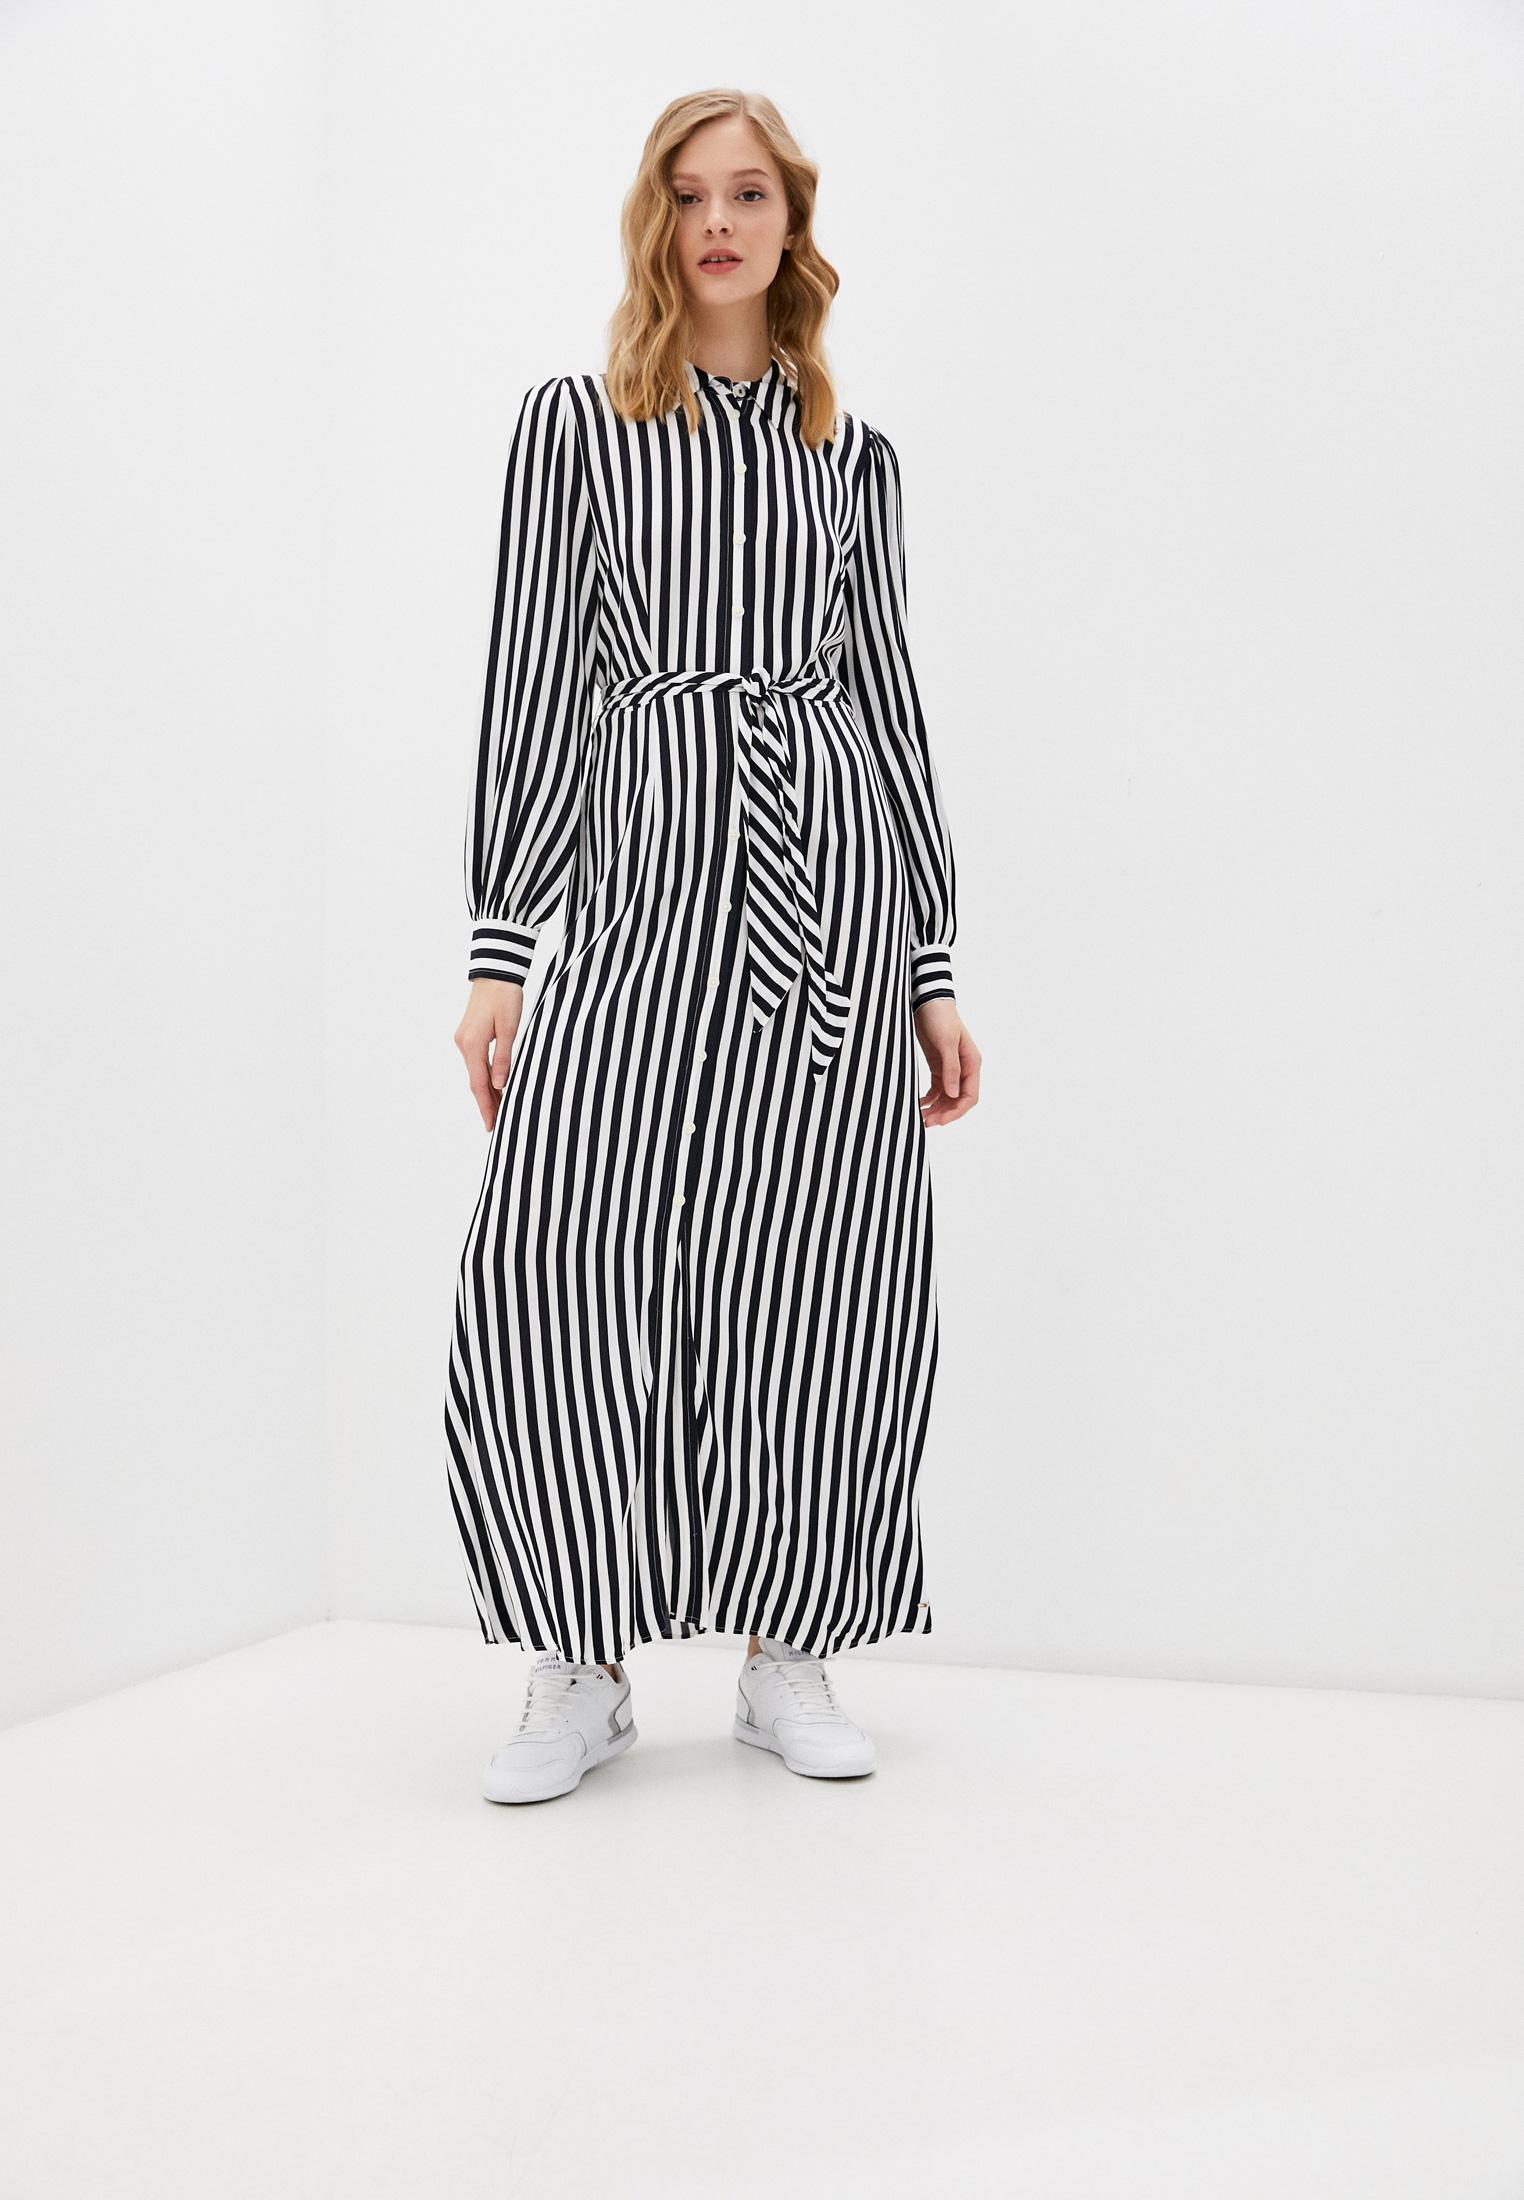 Платье Tommy Hilfiger (Томми Хилфигер) WW0WW30356